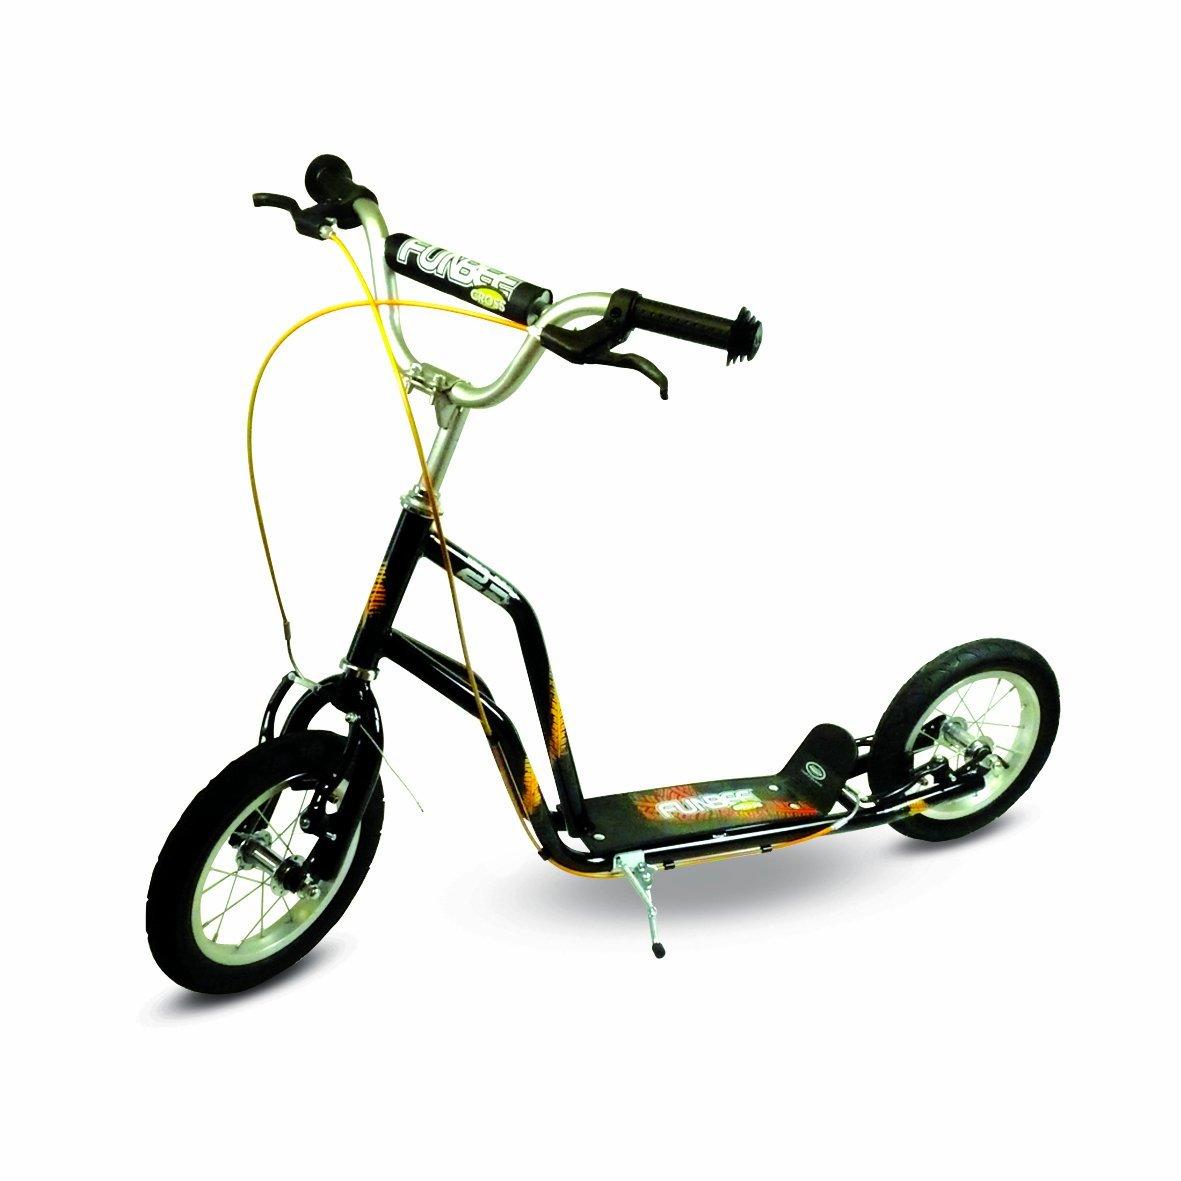 trottinette grosse roue ou petite roue guide dachat